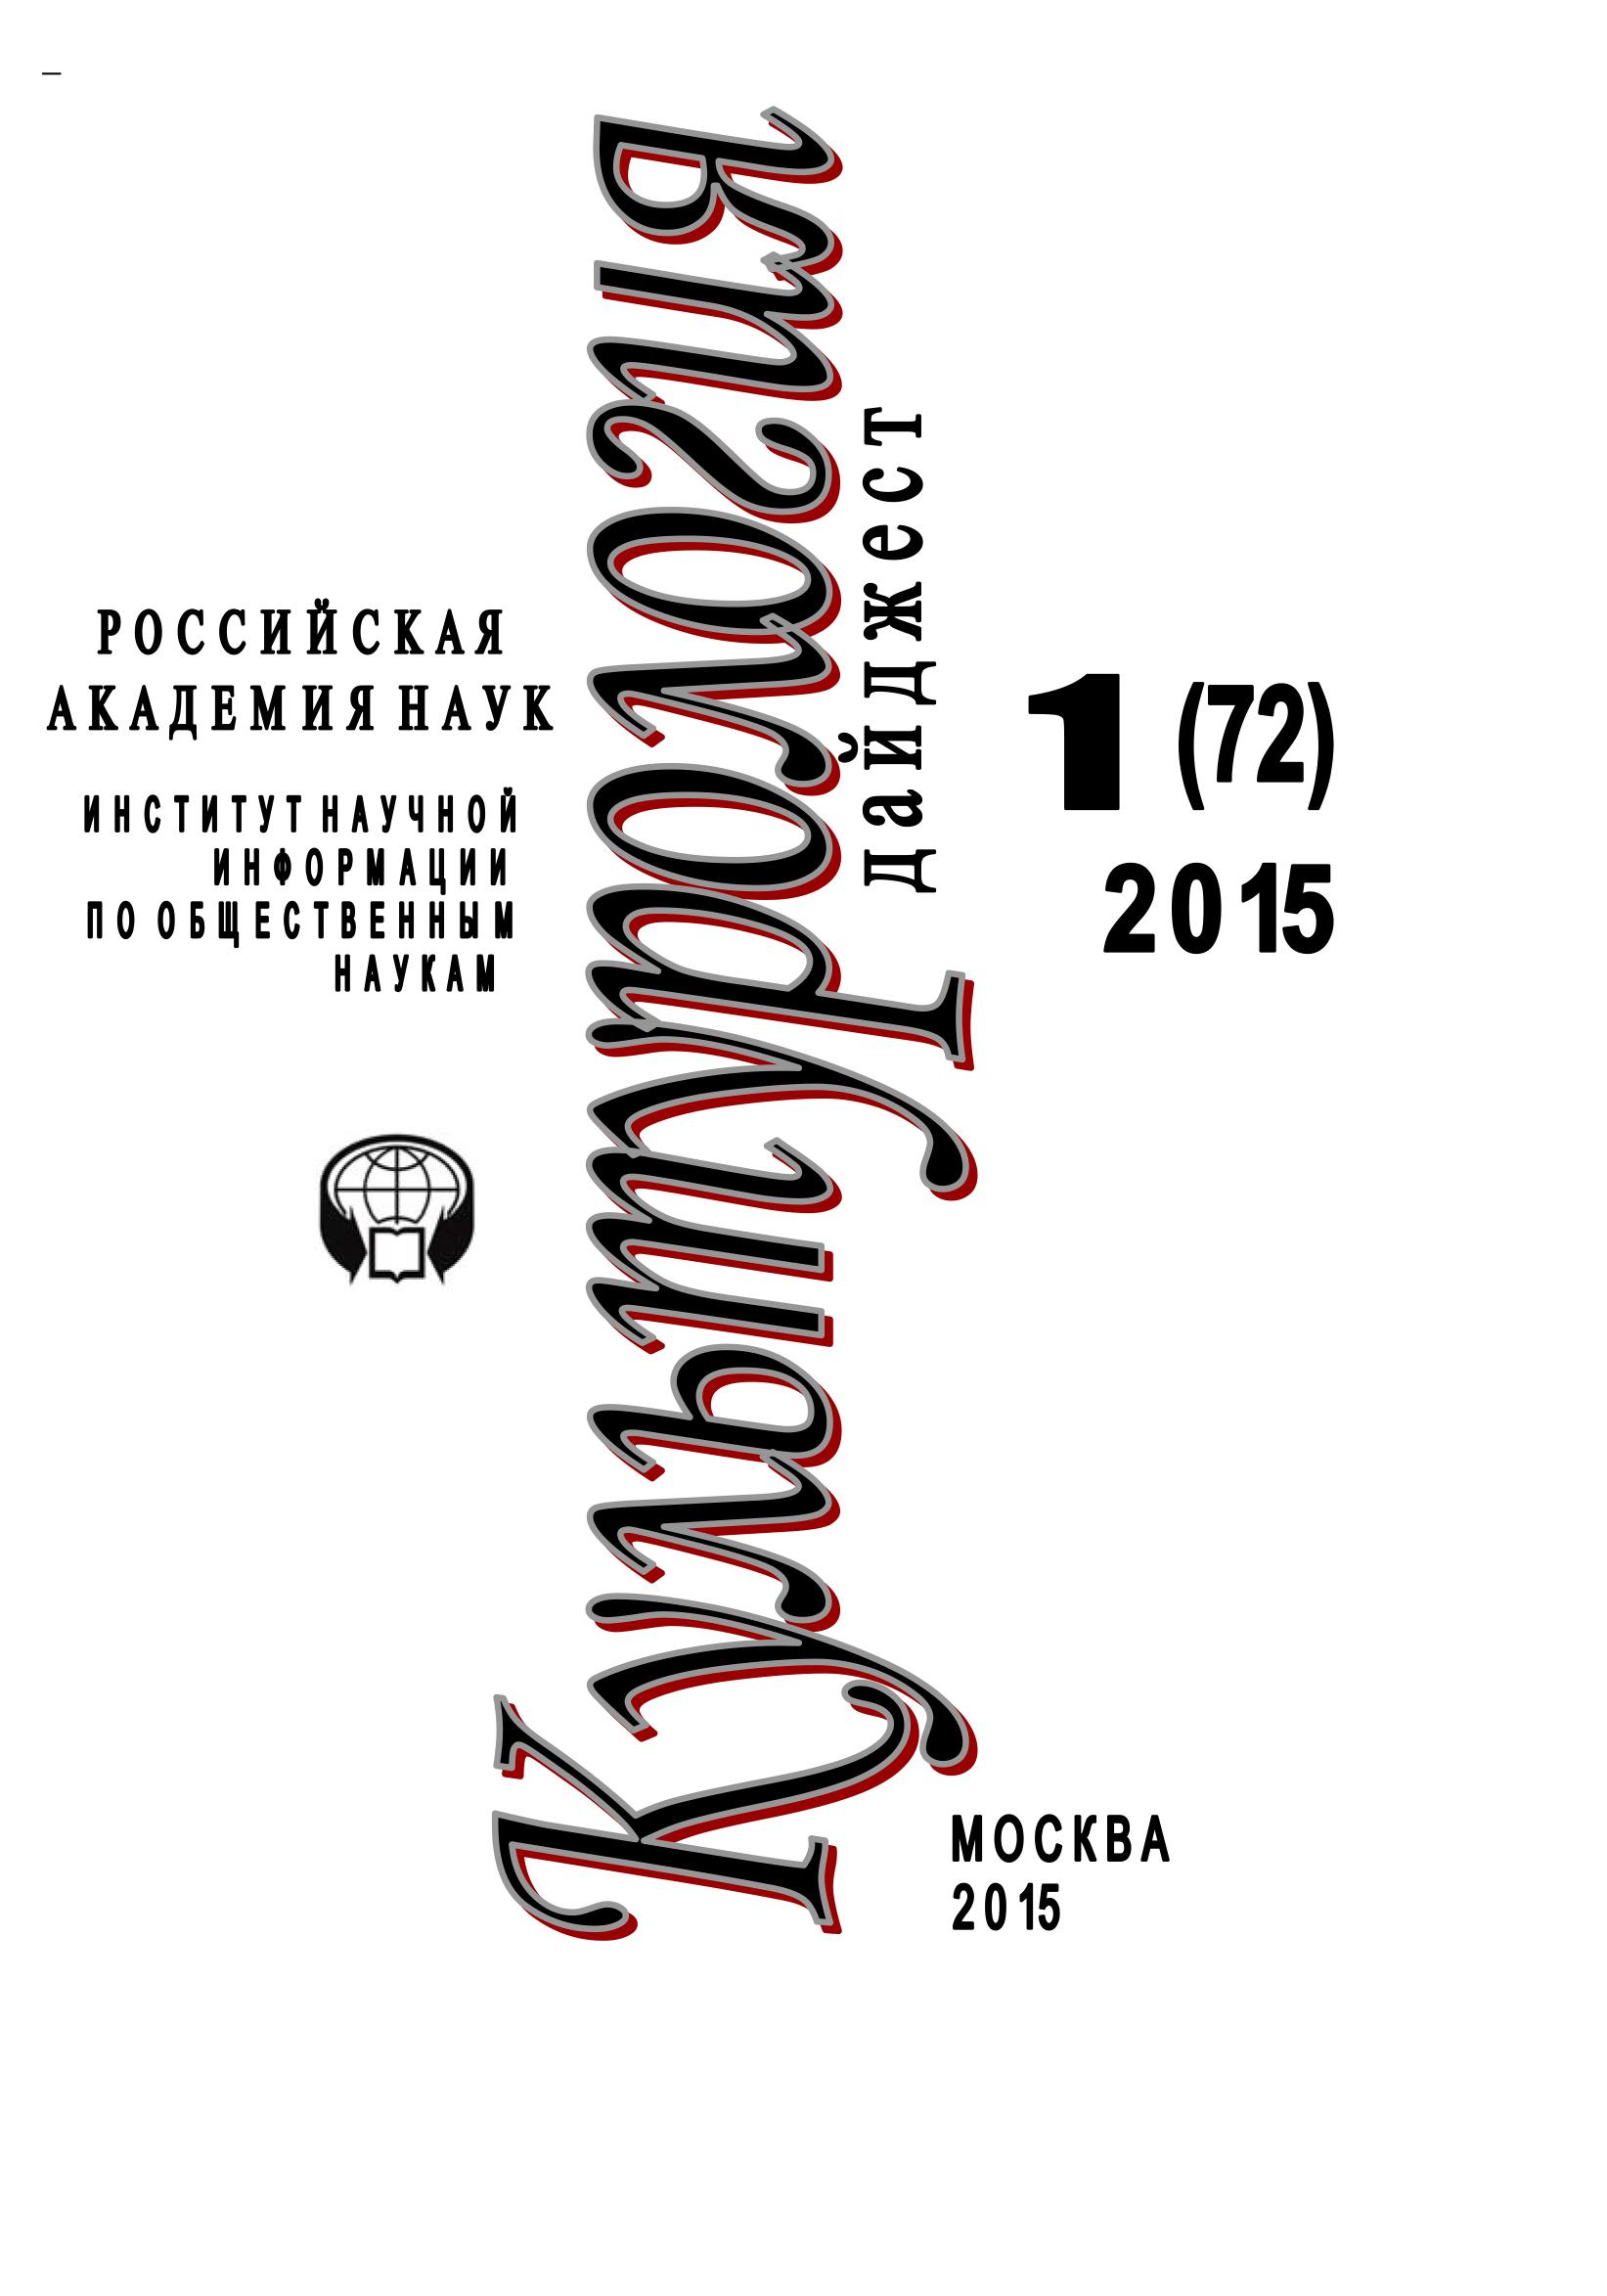 Ирина Галинская Культурология. Дайджест №1 / 2015 ирина галинская культурология дайджест 1 2015